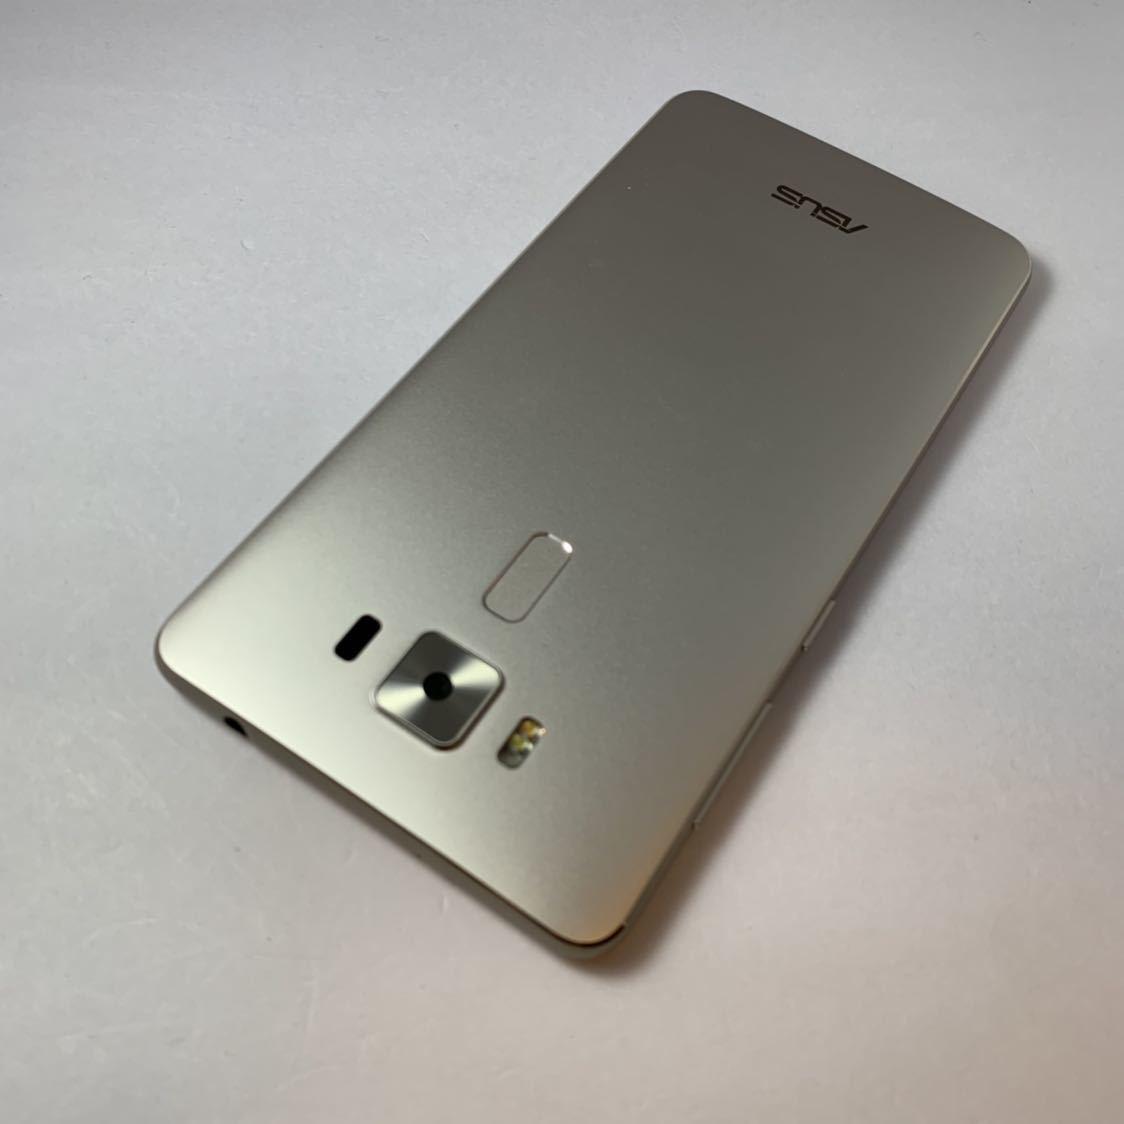 ASUS Zenfone 3 Deluxe 5.5 ZS550KL 64GB SIMフリー 本体 Z01FD ゴールド 海外版